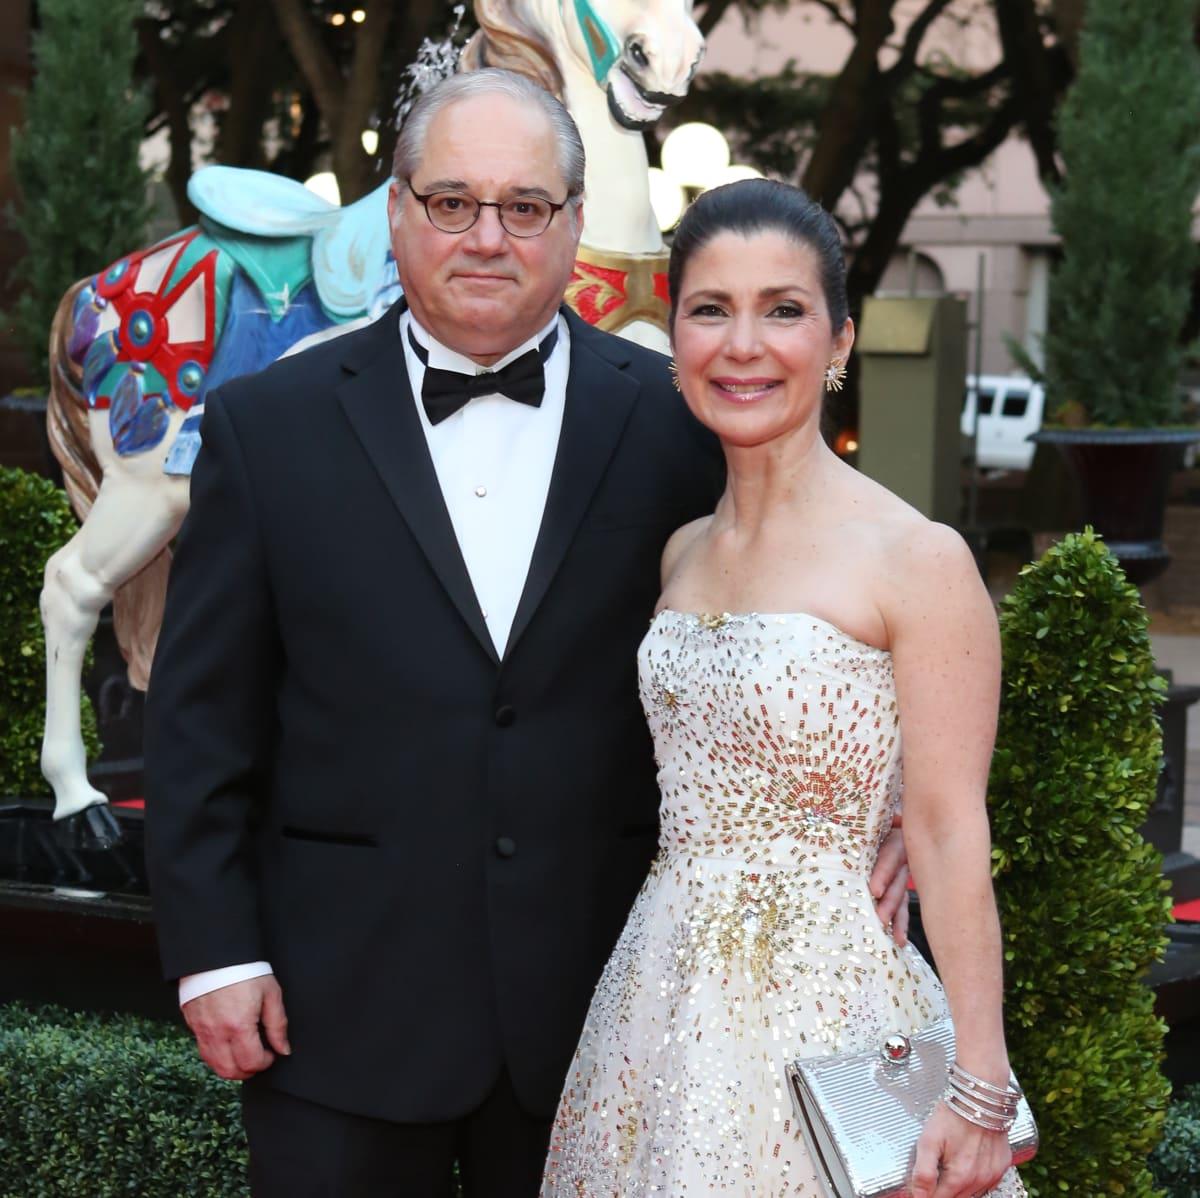 Houston Grand Opera Ball, 4/16  Tony Petrello, Cynthia Petrello